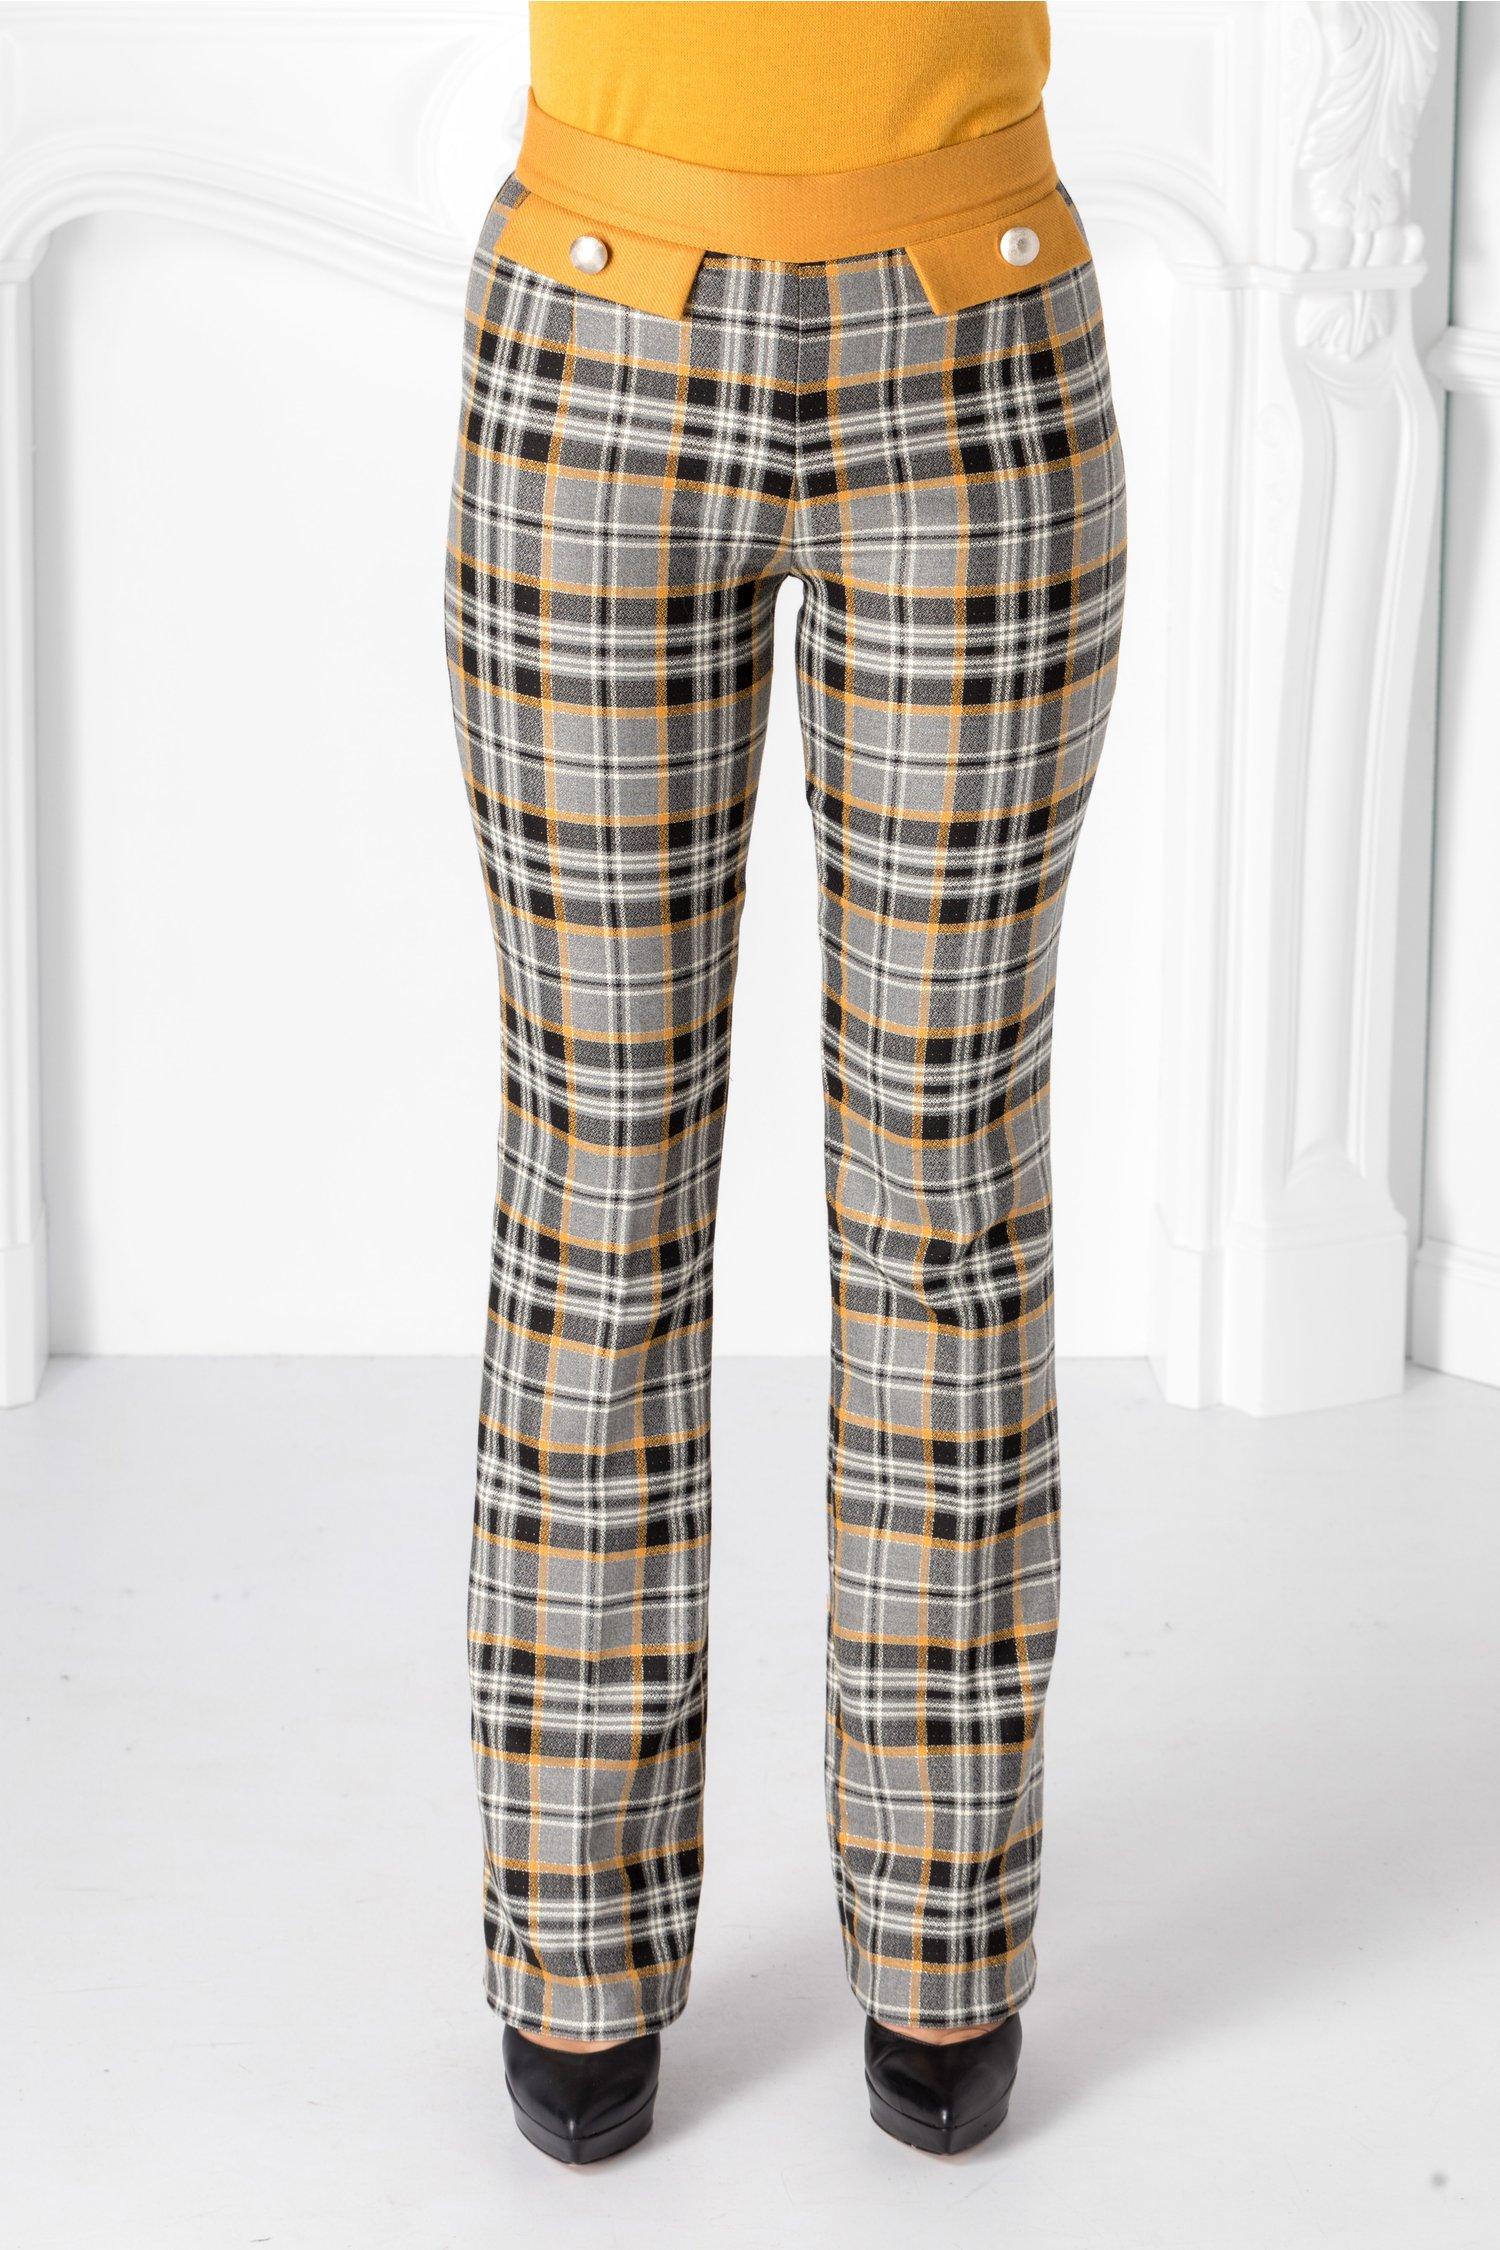 Pantaloni Pretty gri cu carouri galbene thumbnail